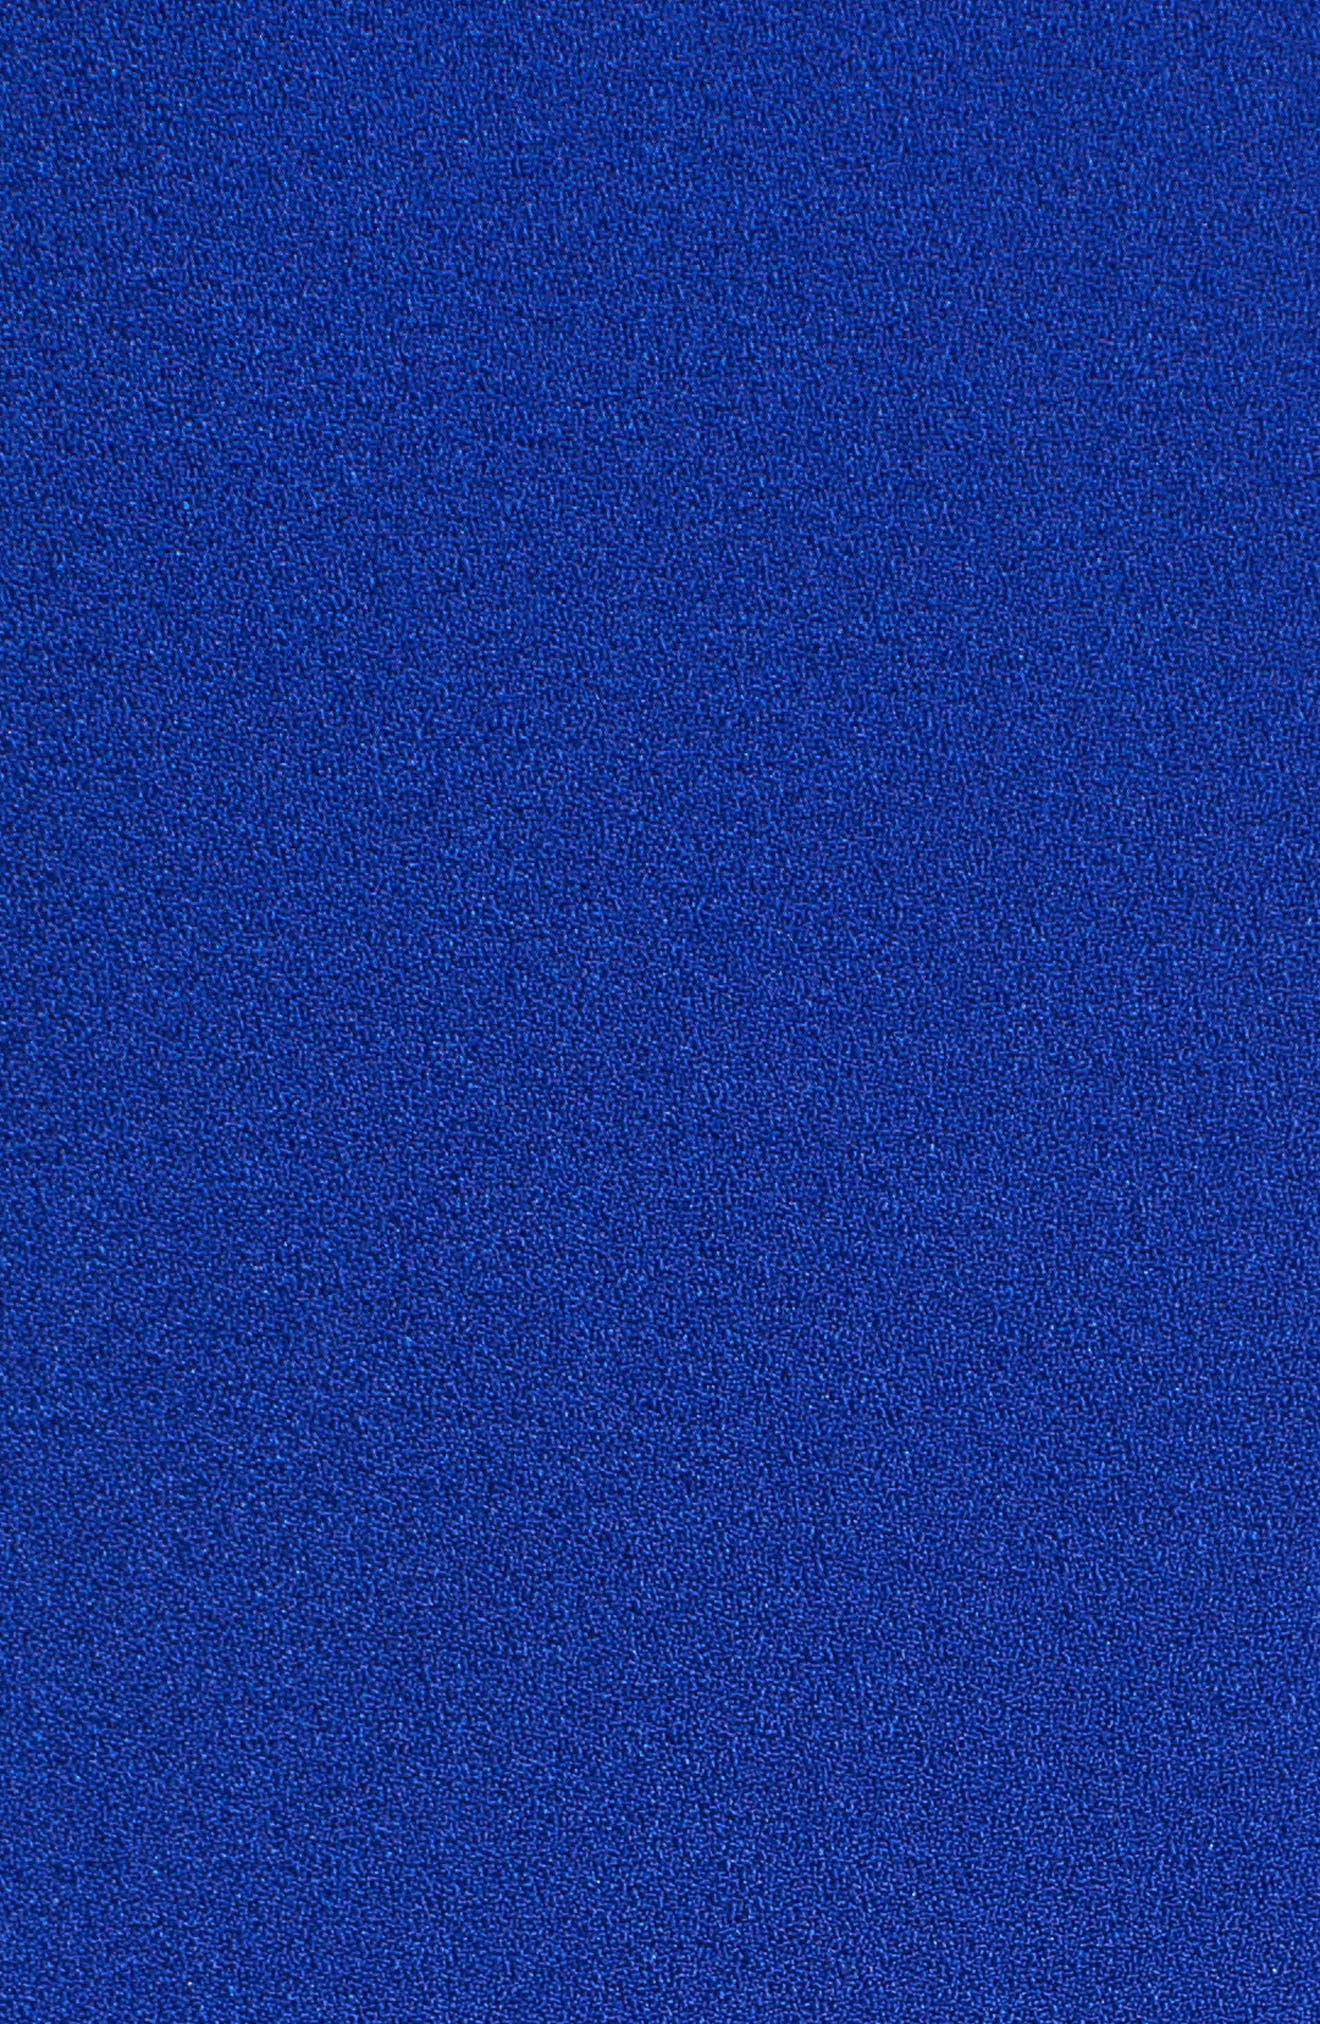 Alternate Image 5  - Vince Camuto Sleeveless Crepe Sheath Dress (Regular & Petite)